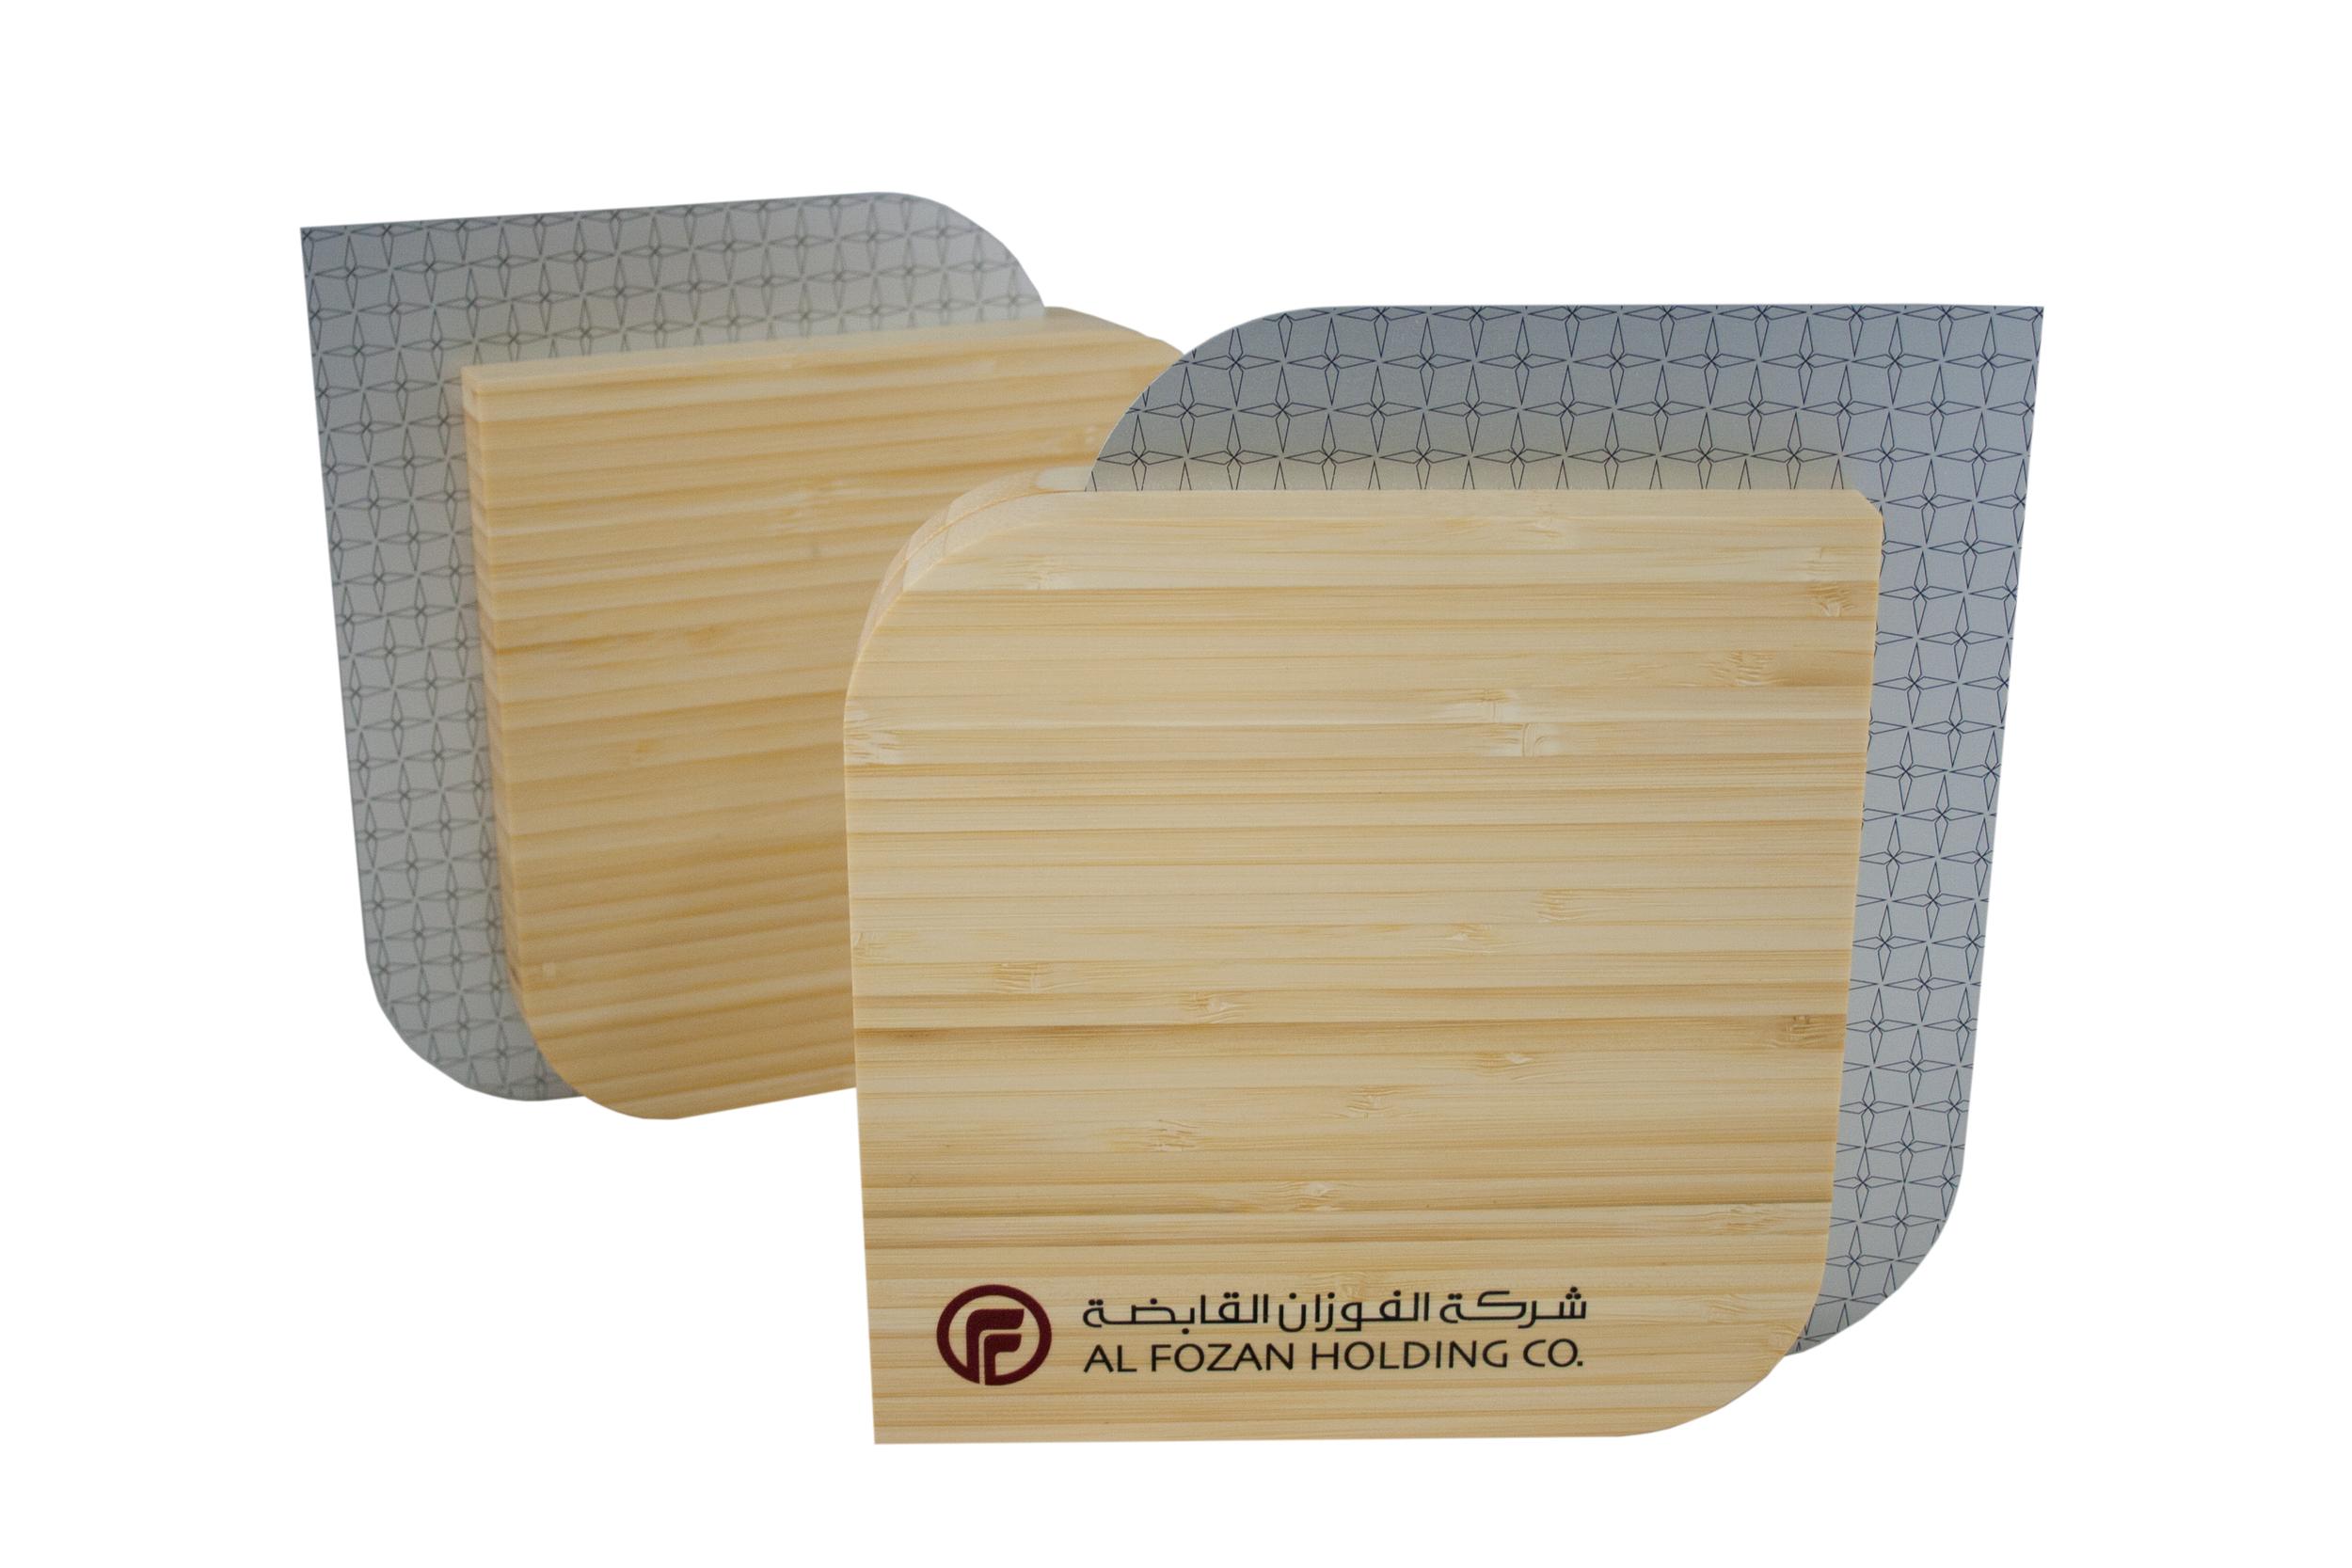 al fozan holdings co - custom eco-friendly plaque design